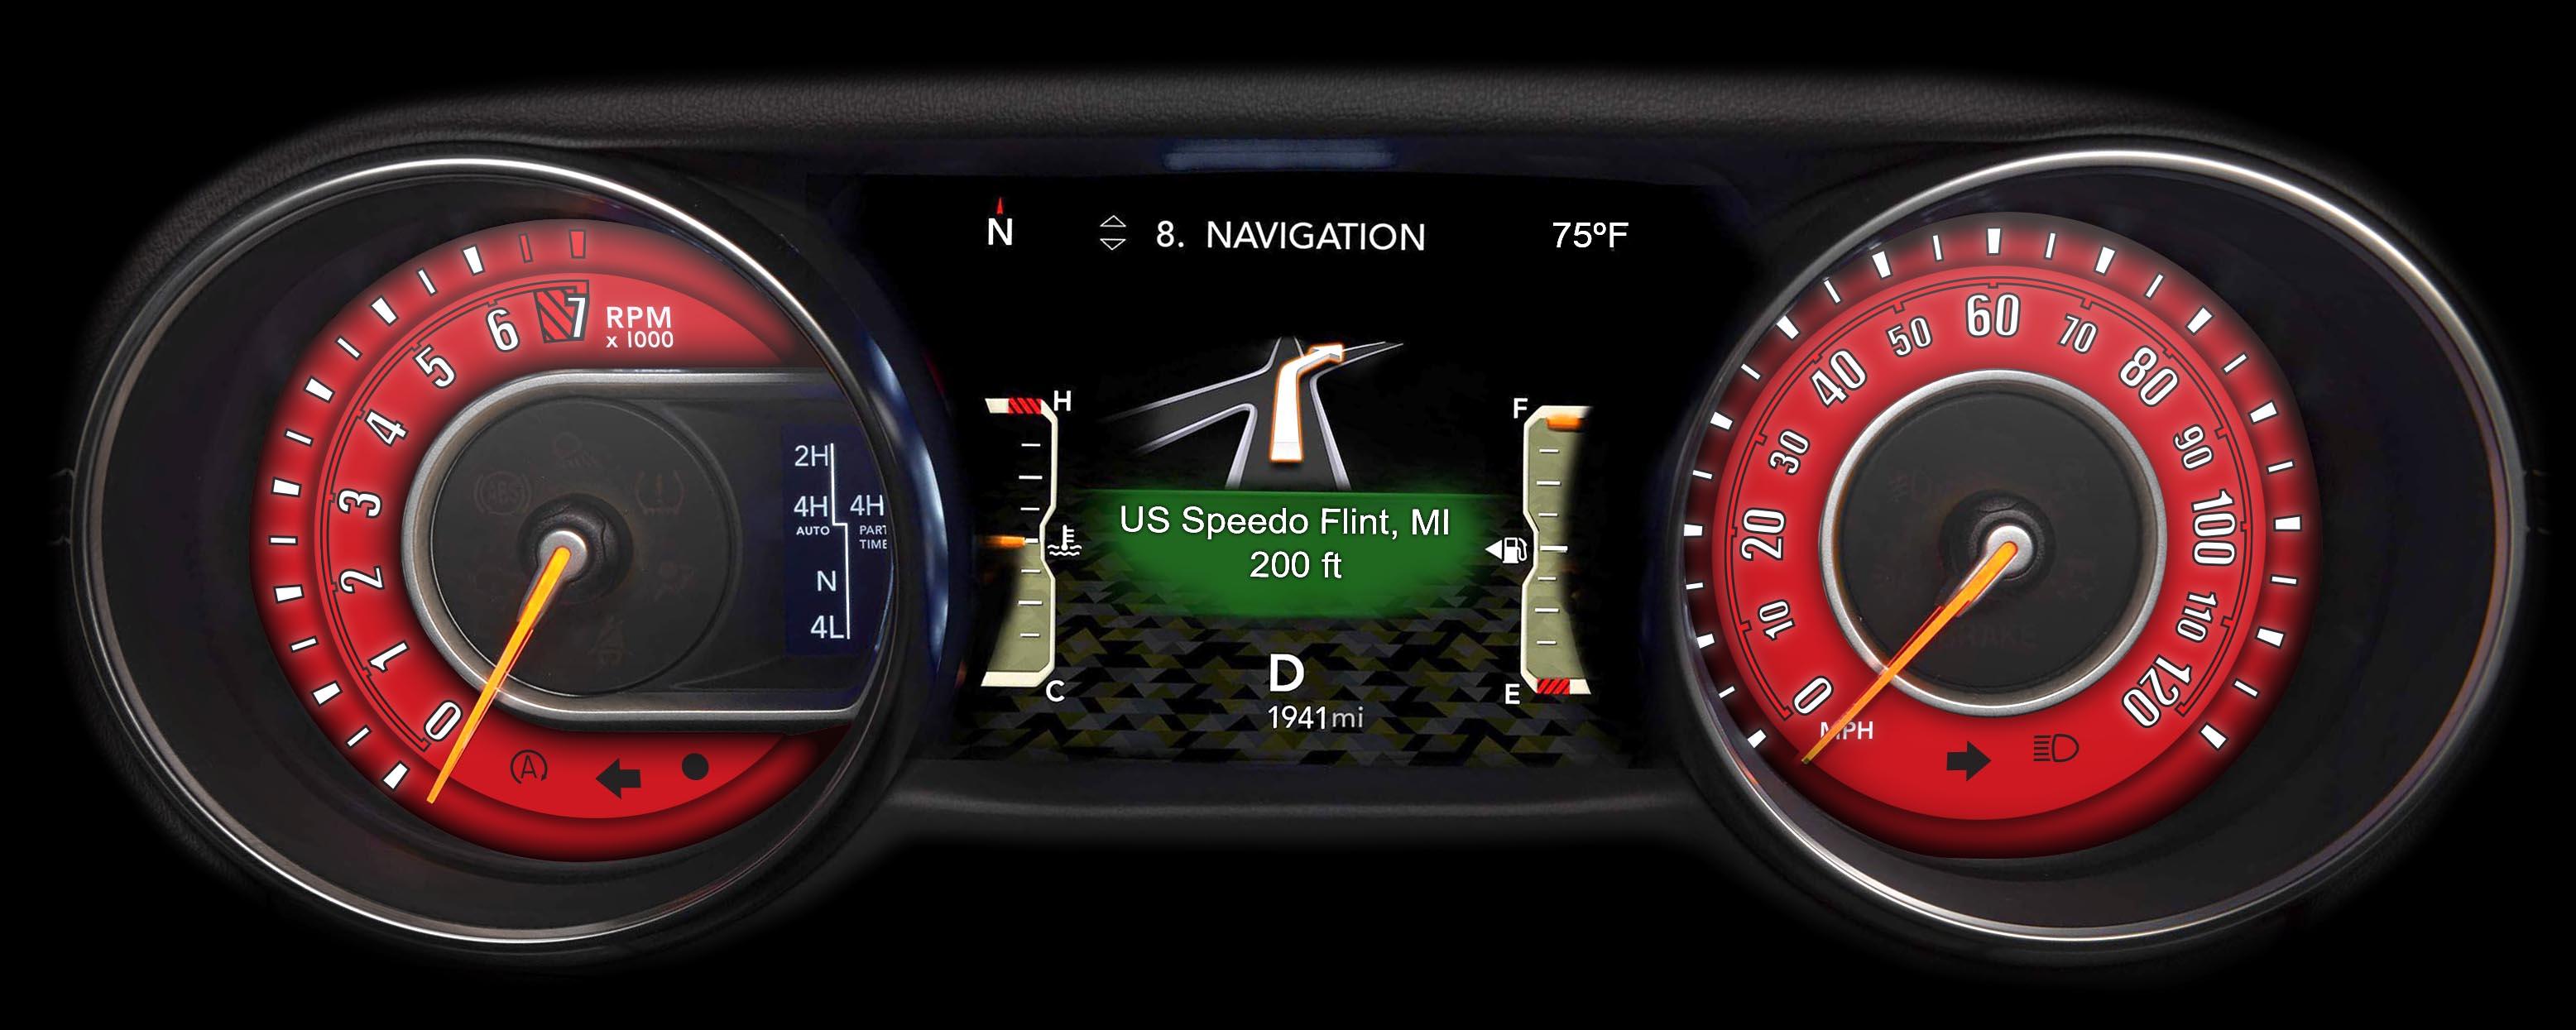 Jeep Wrangler JL Daytona Edition